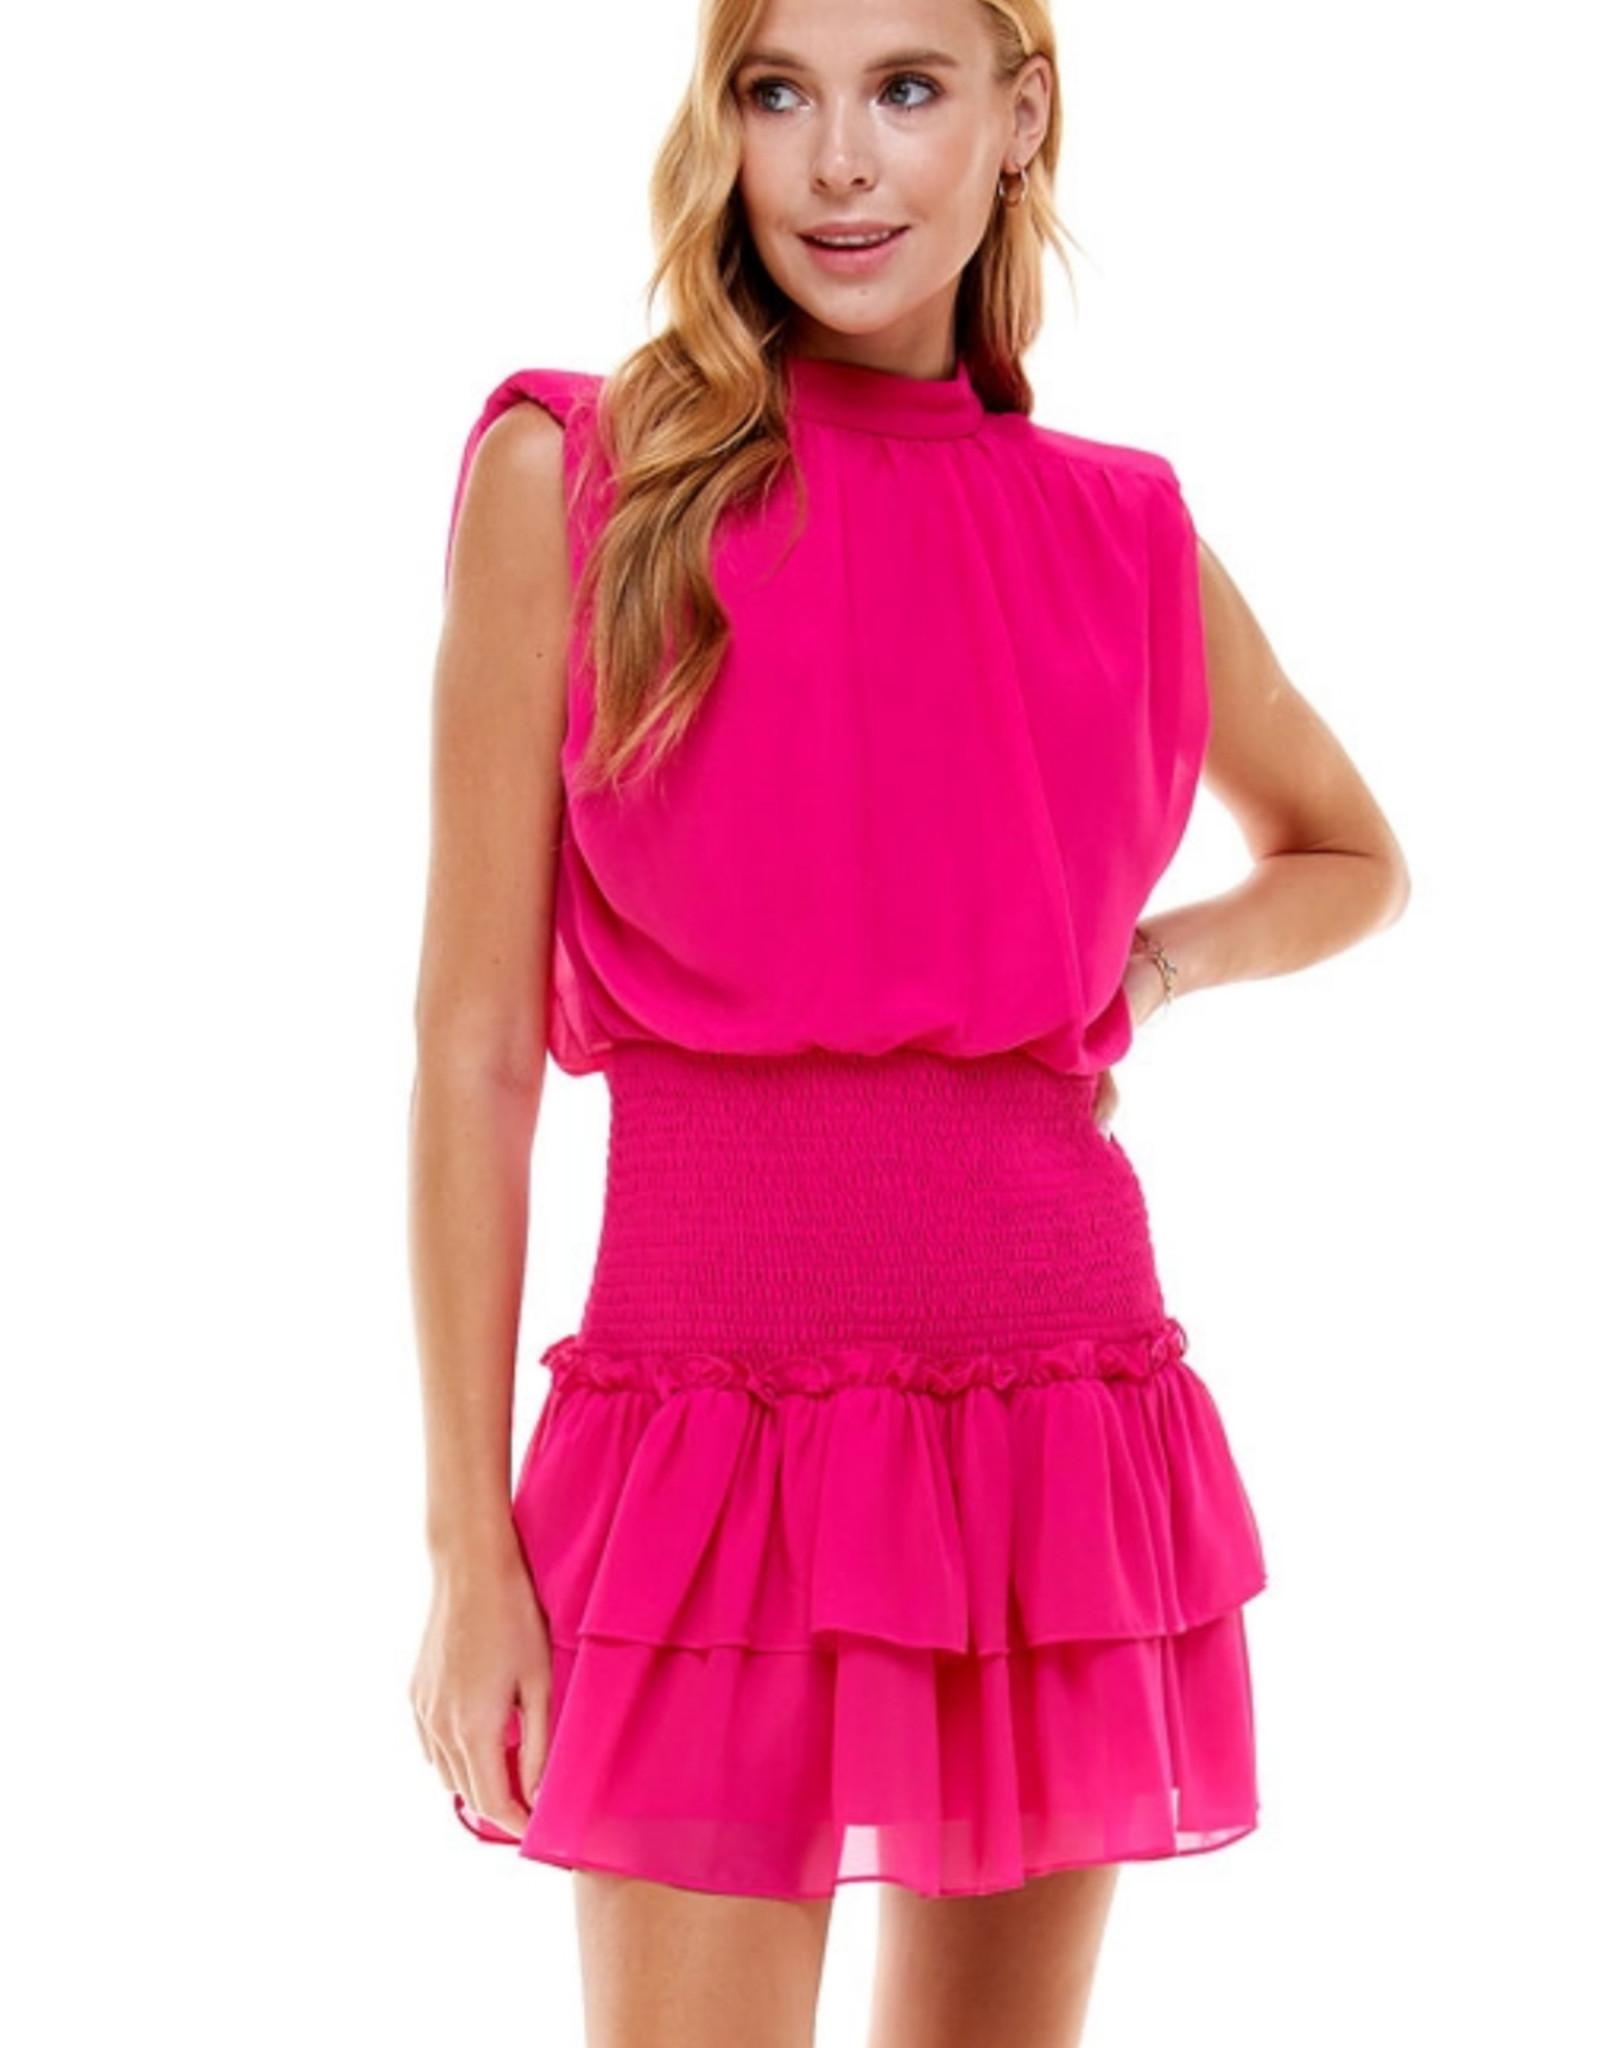 Ruffled Shoulder Pad Dress